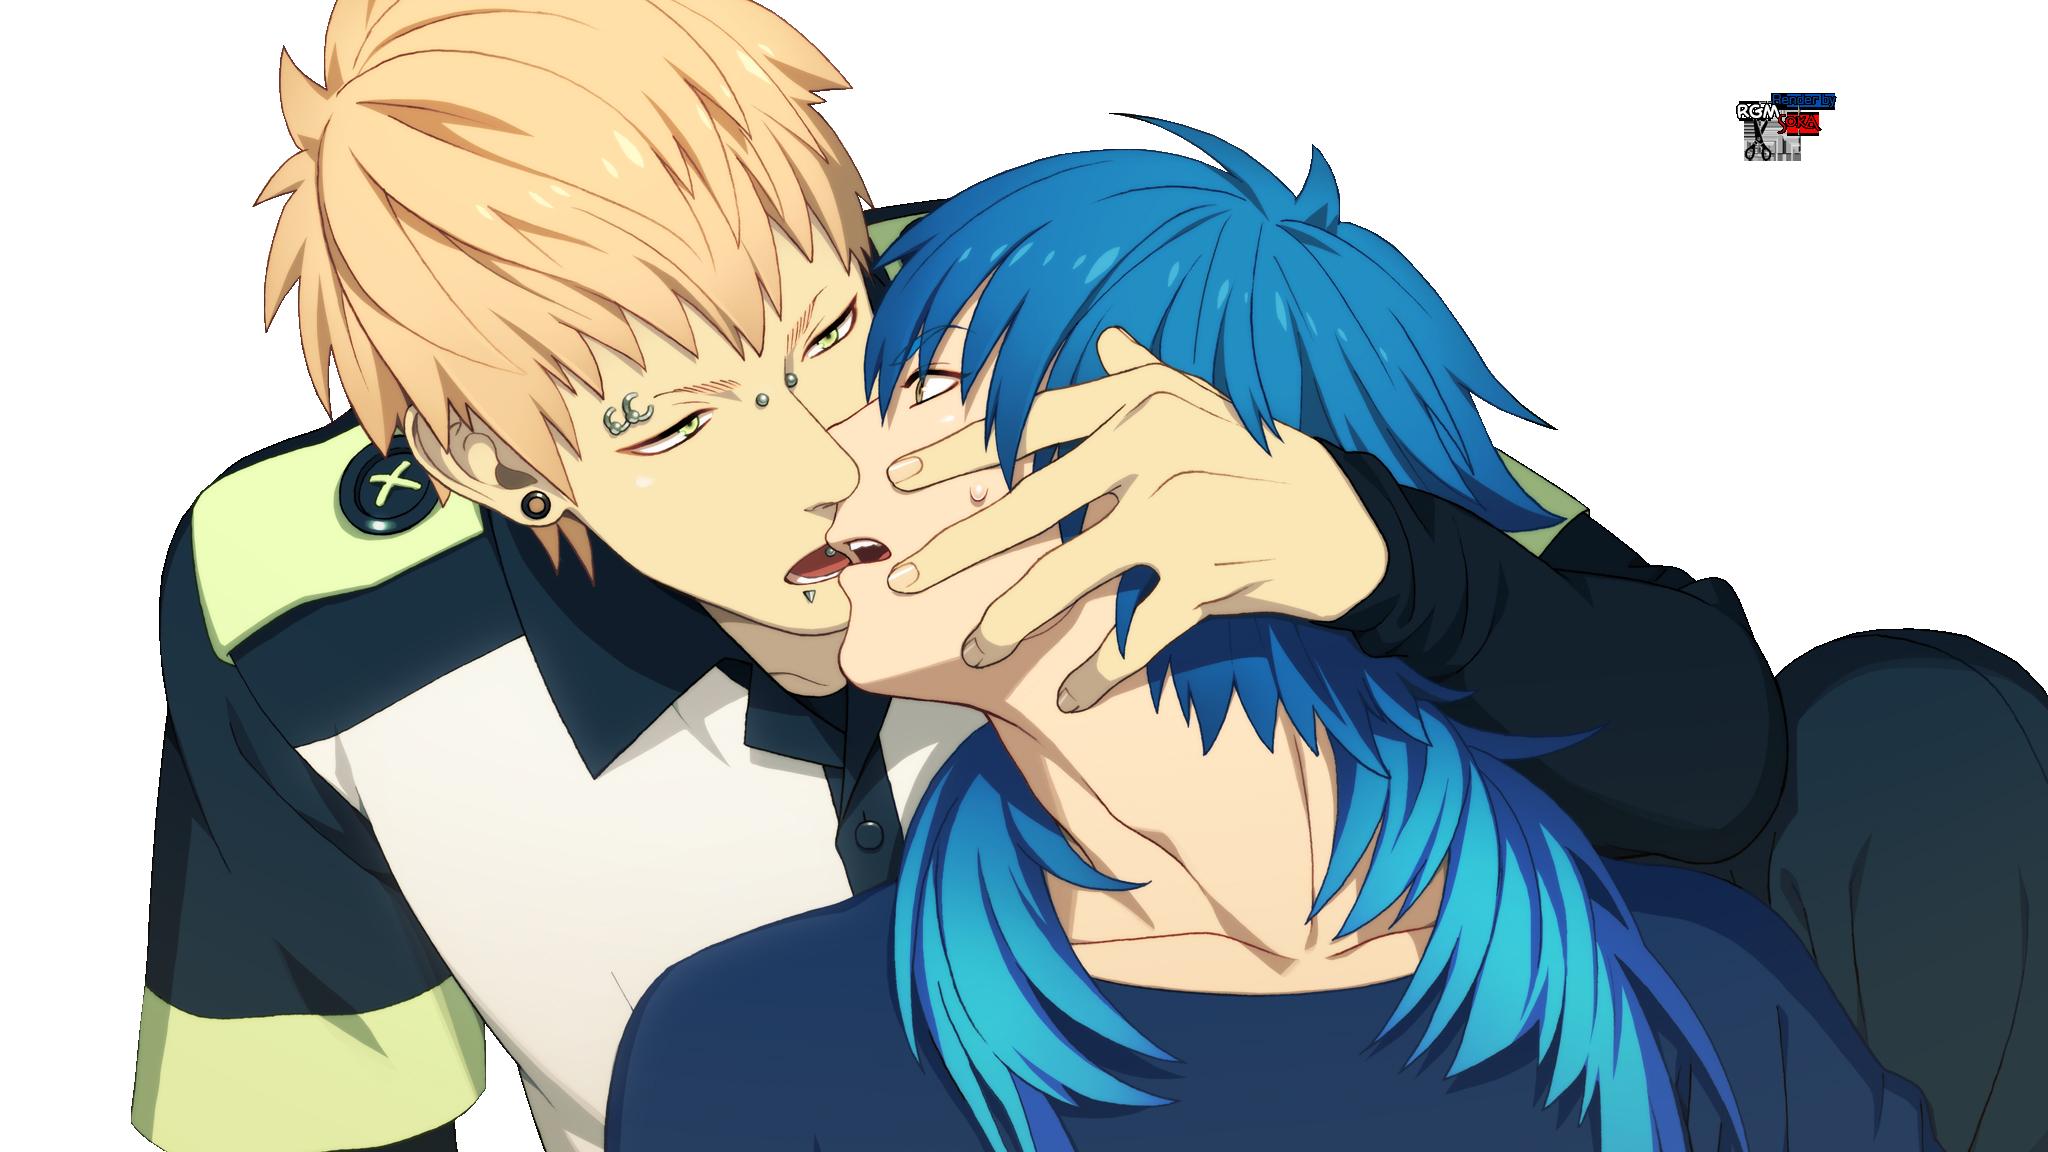 Anime sex murder